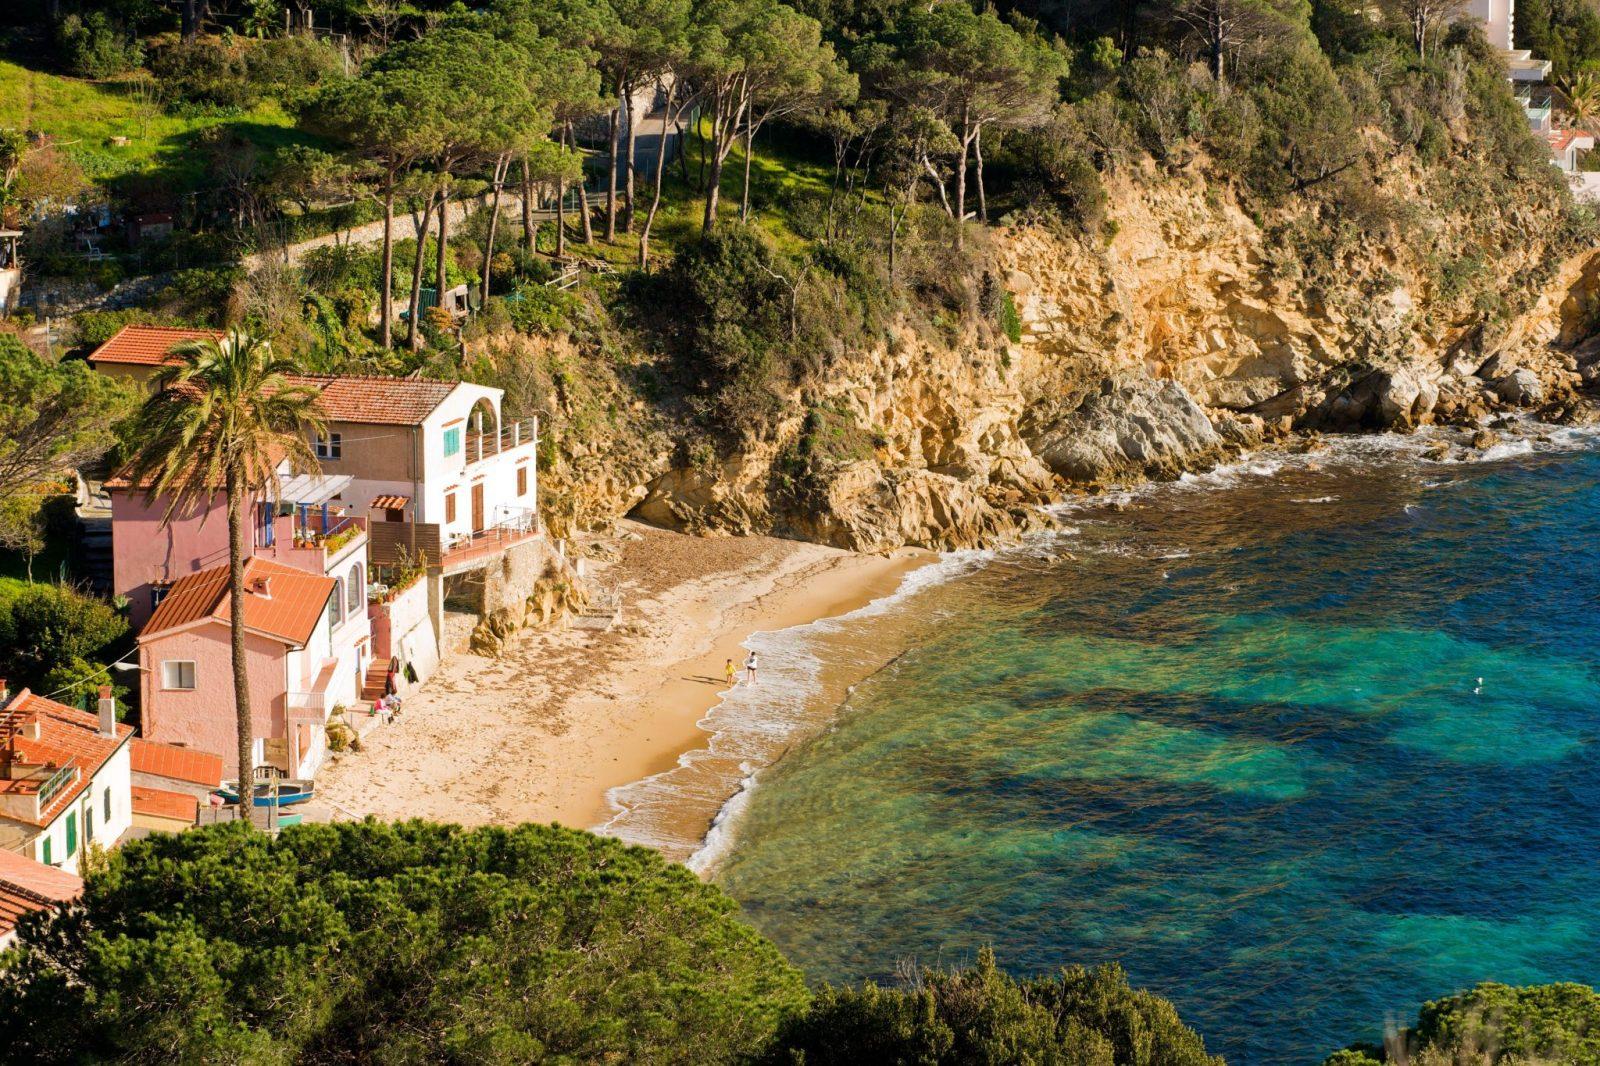 Great tuscany honeymoon towns italy4real for Honeymoon spots in virginia